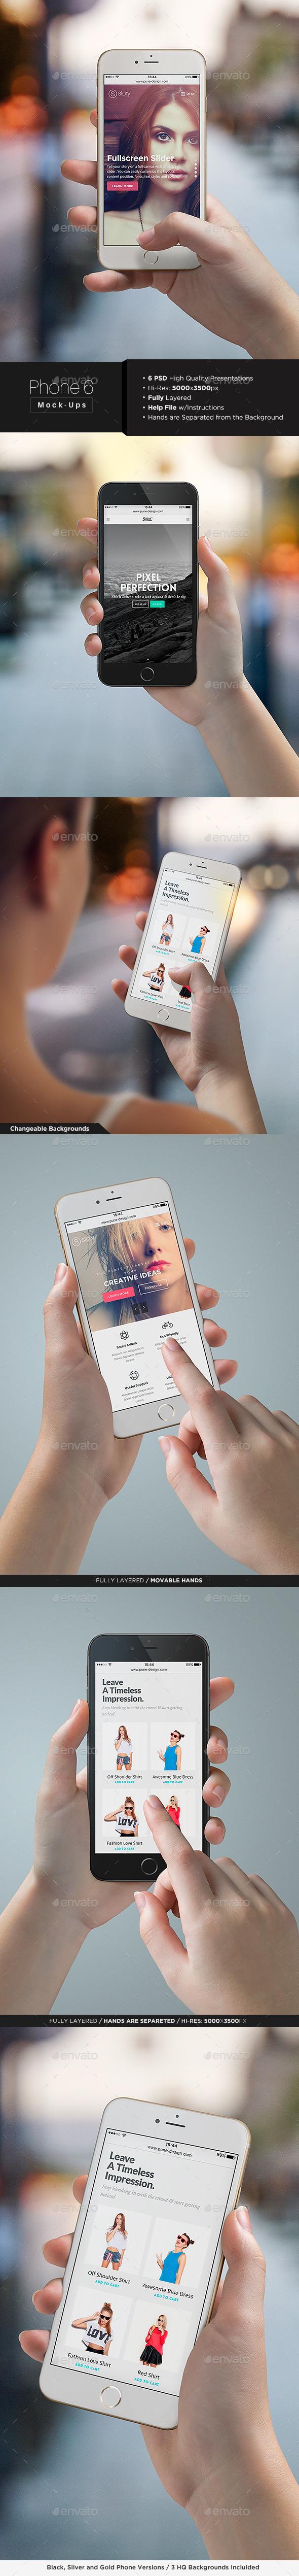 Phone 6 Mock-Up - Mobile Displays